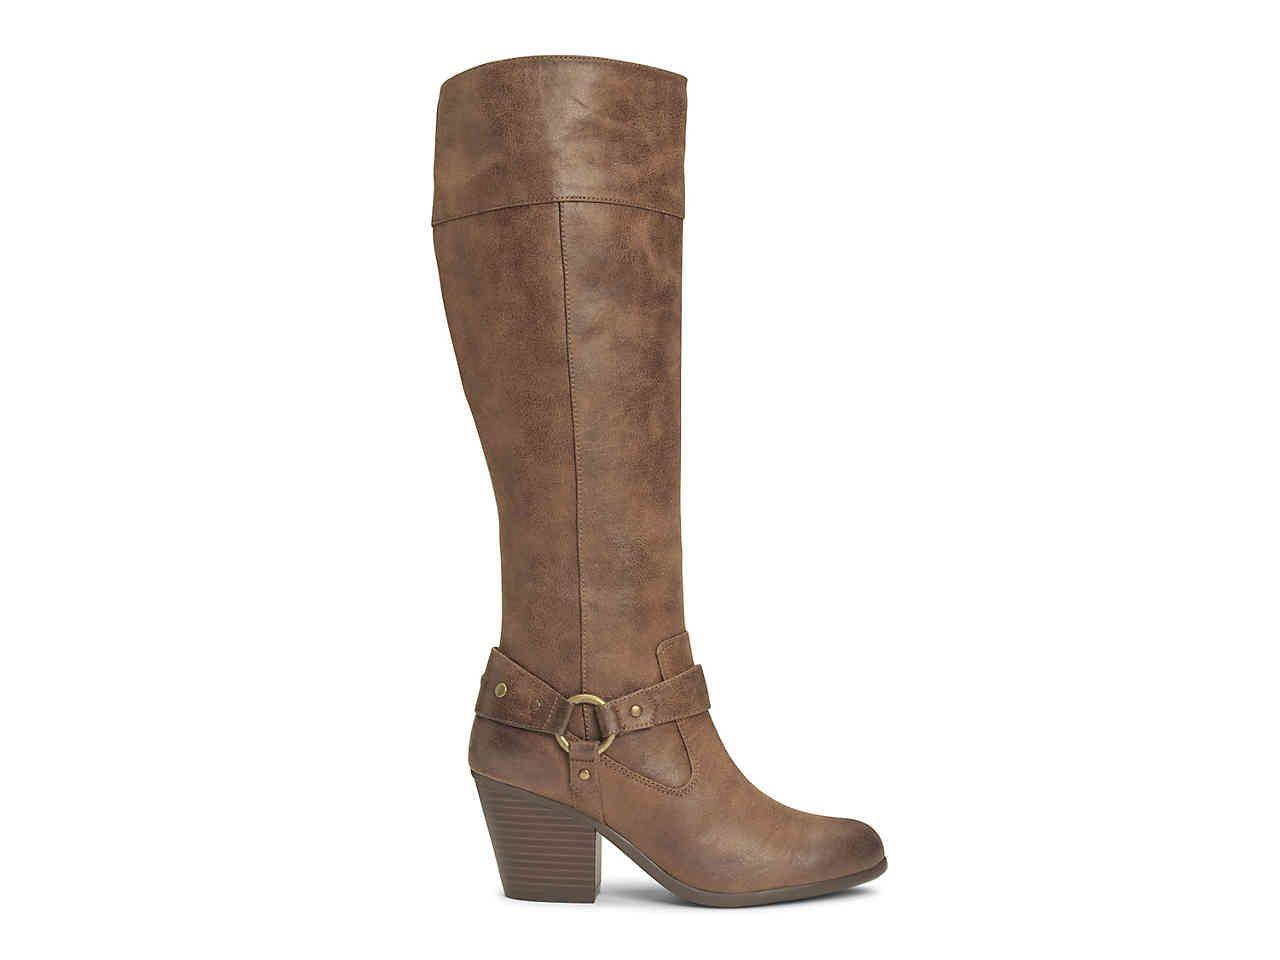 1cda63fdcb5 A2 by Aerosoles Creativity Boot Women s Shoes